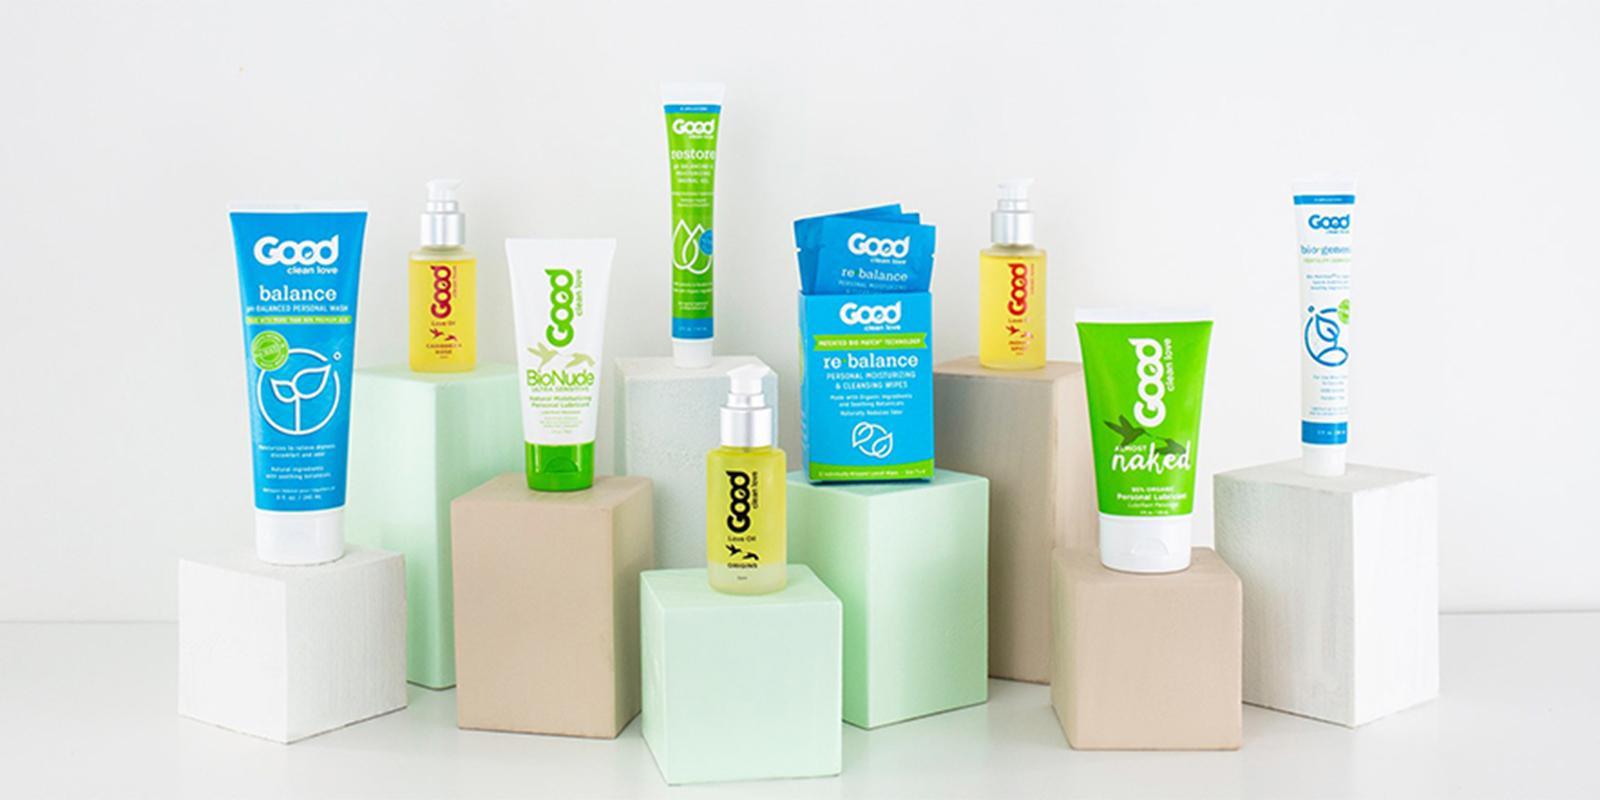 Produkty od Good Clean Love